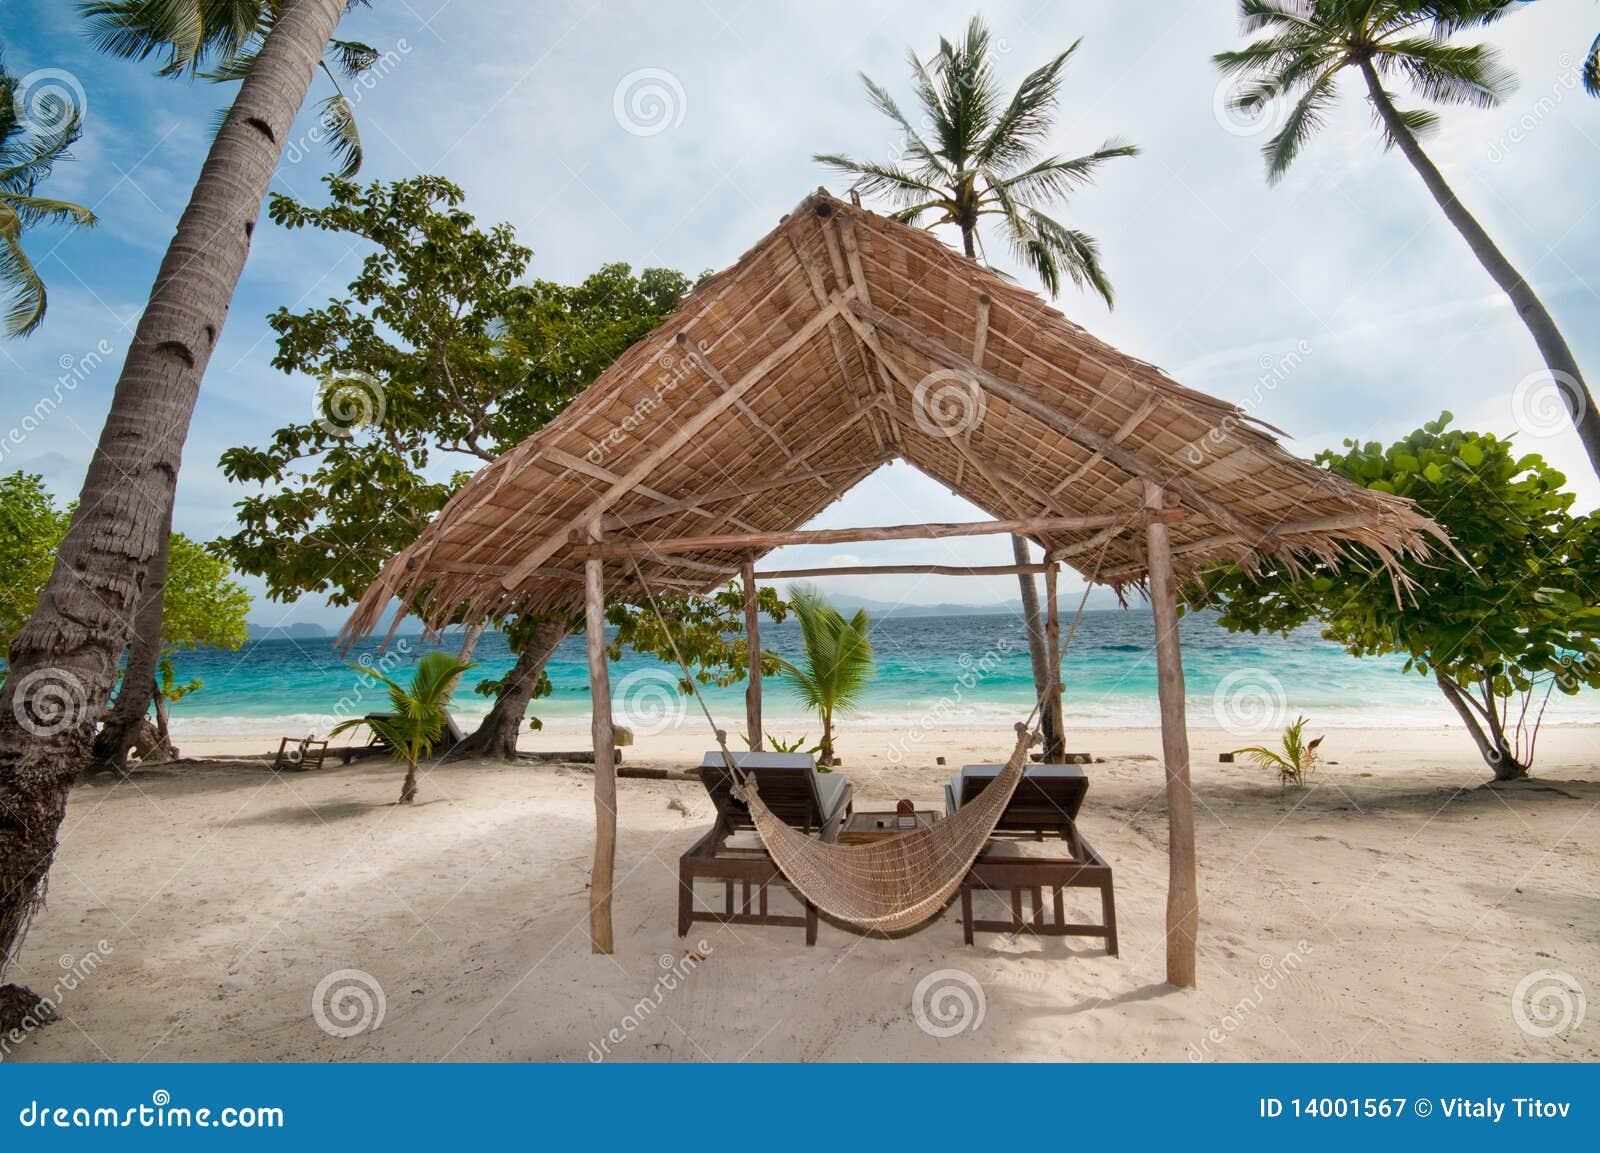 Tropical Island Beach Hut: Tropical Hut Royalty Free Stock Photography